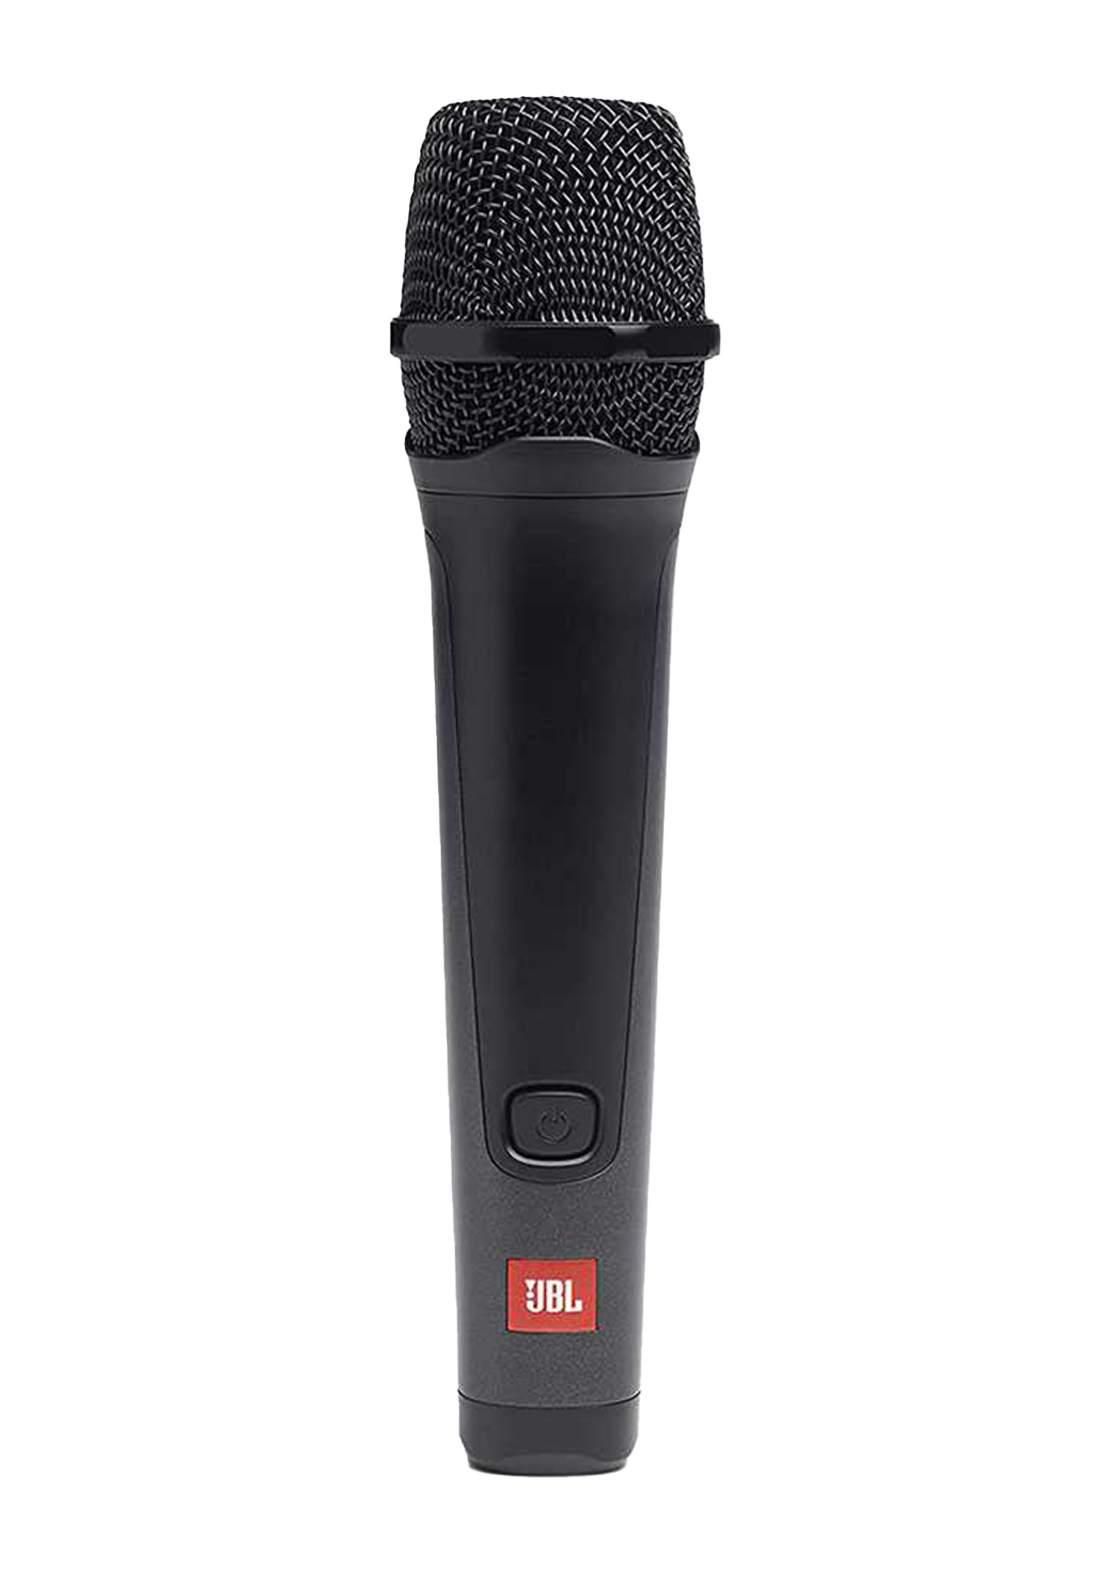 JBL PBM 100 Wired Microphone - Black مايكرفون